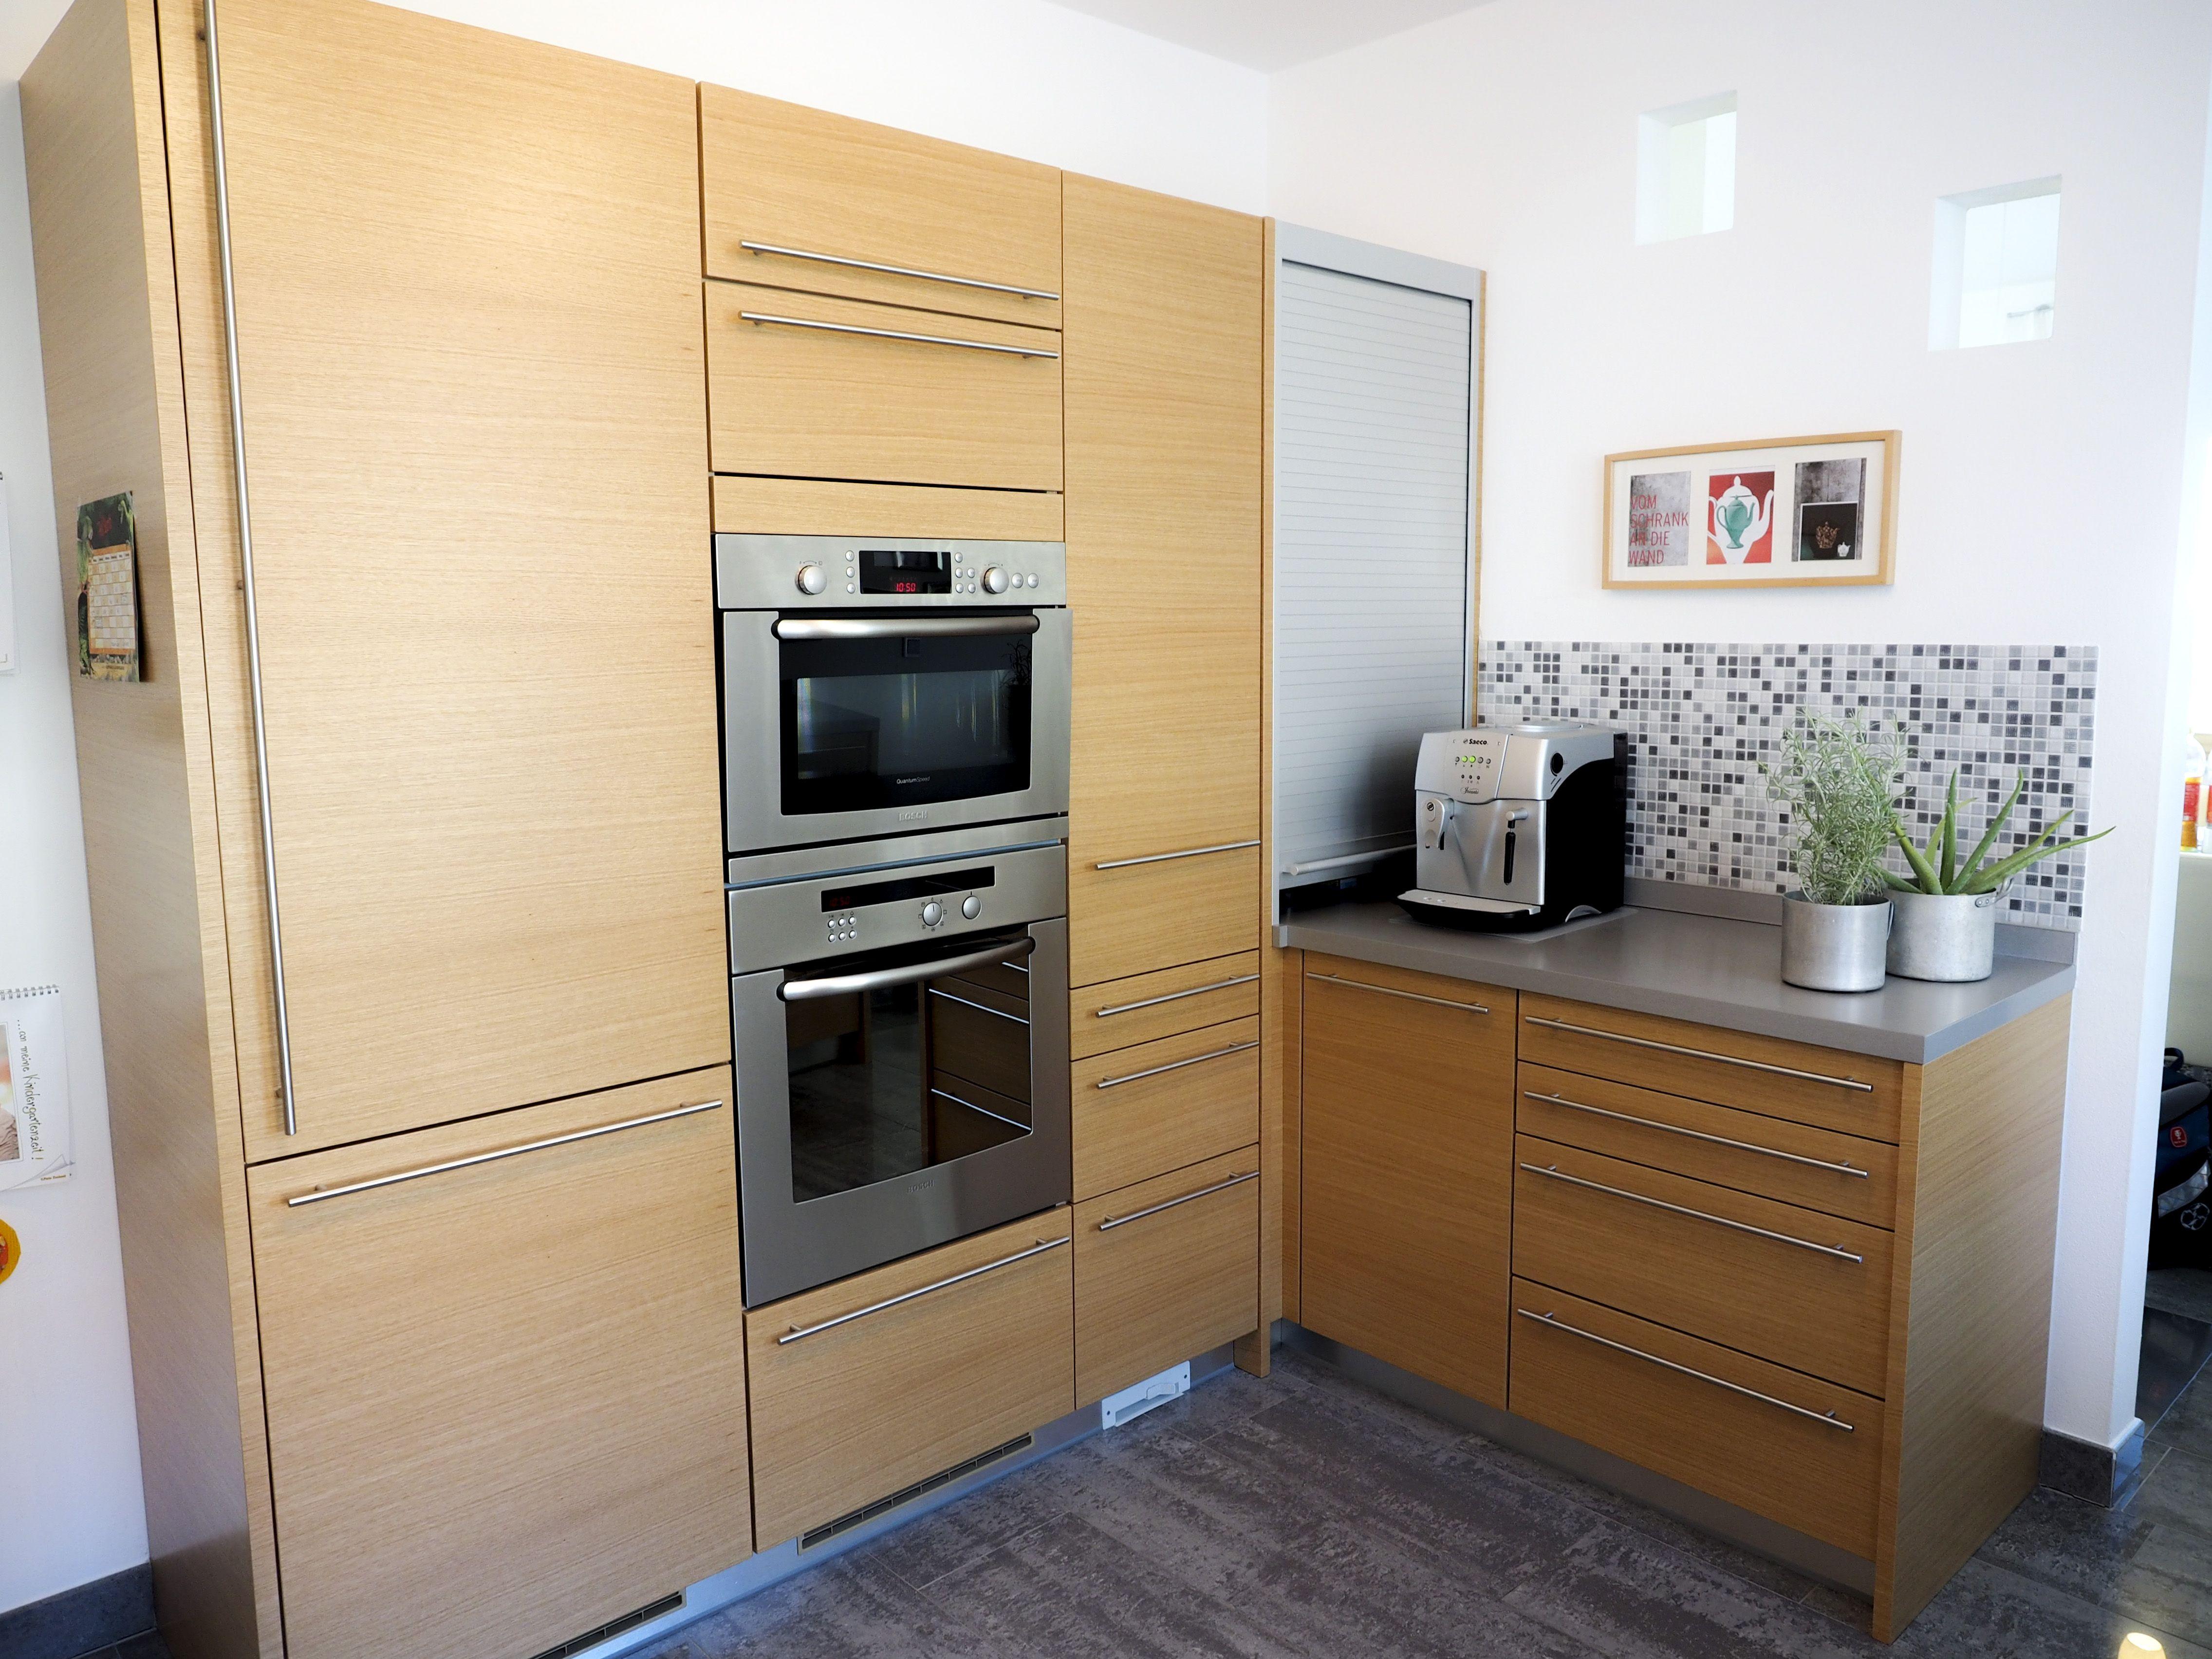 Bestehende Küche bekam neue Fronten | Deco | Pinterest